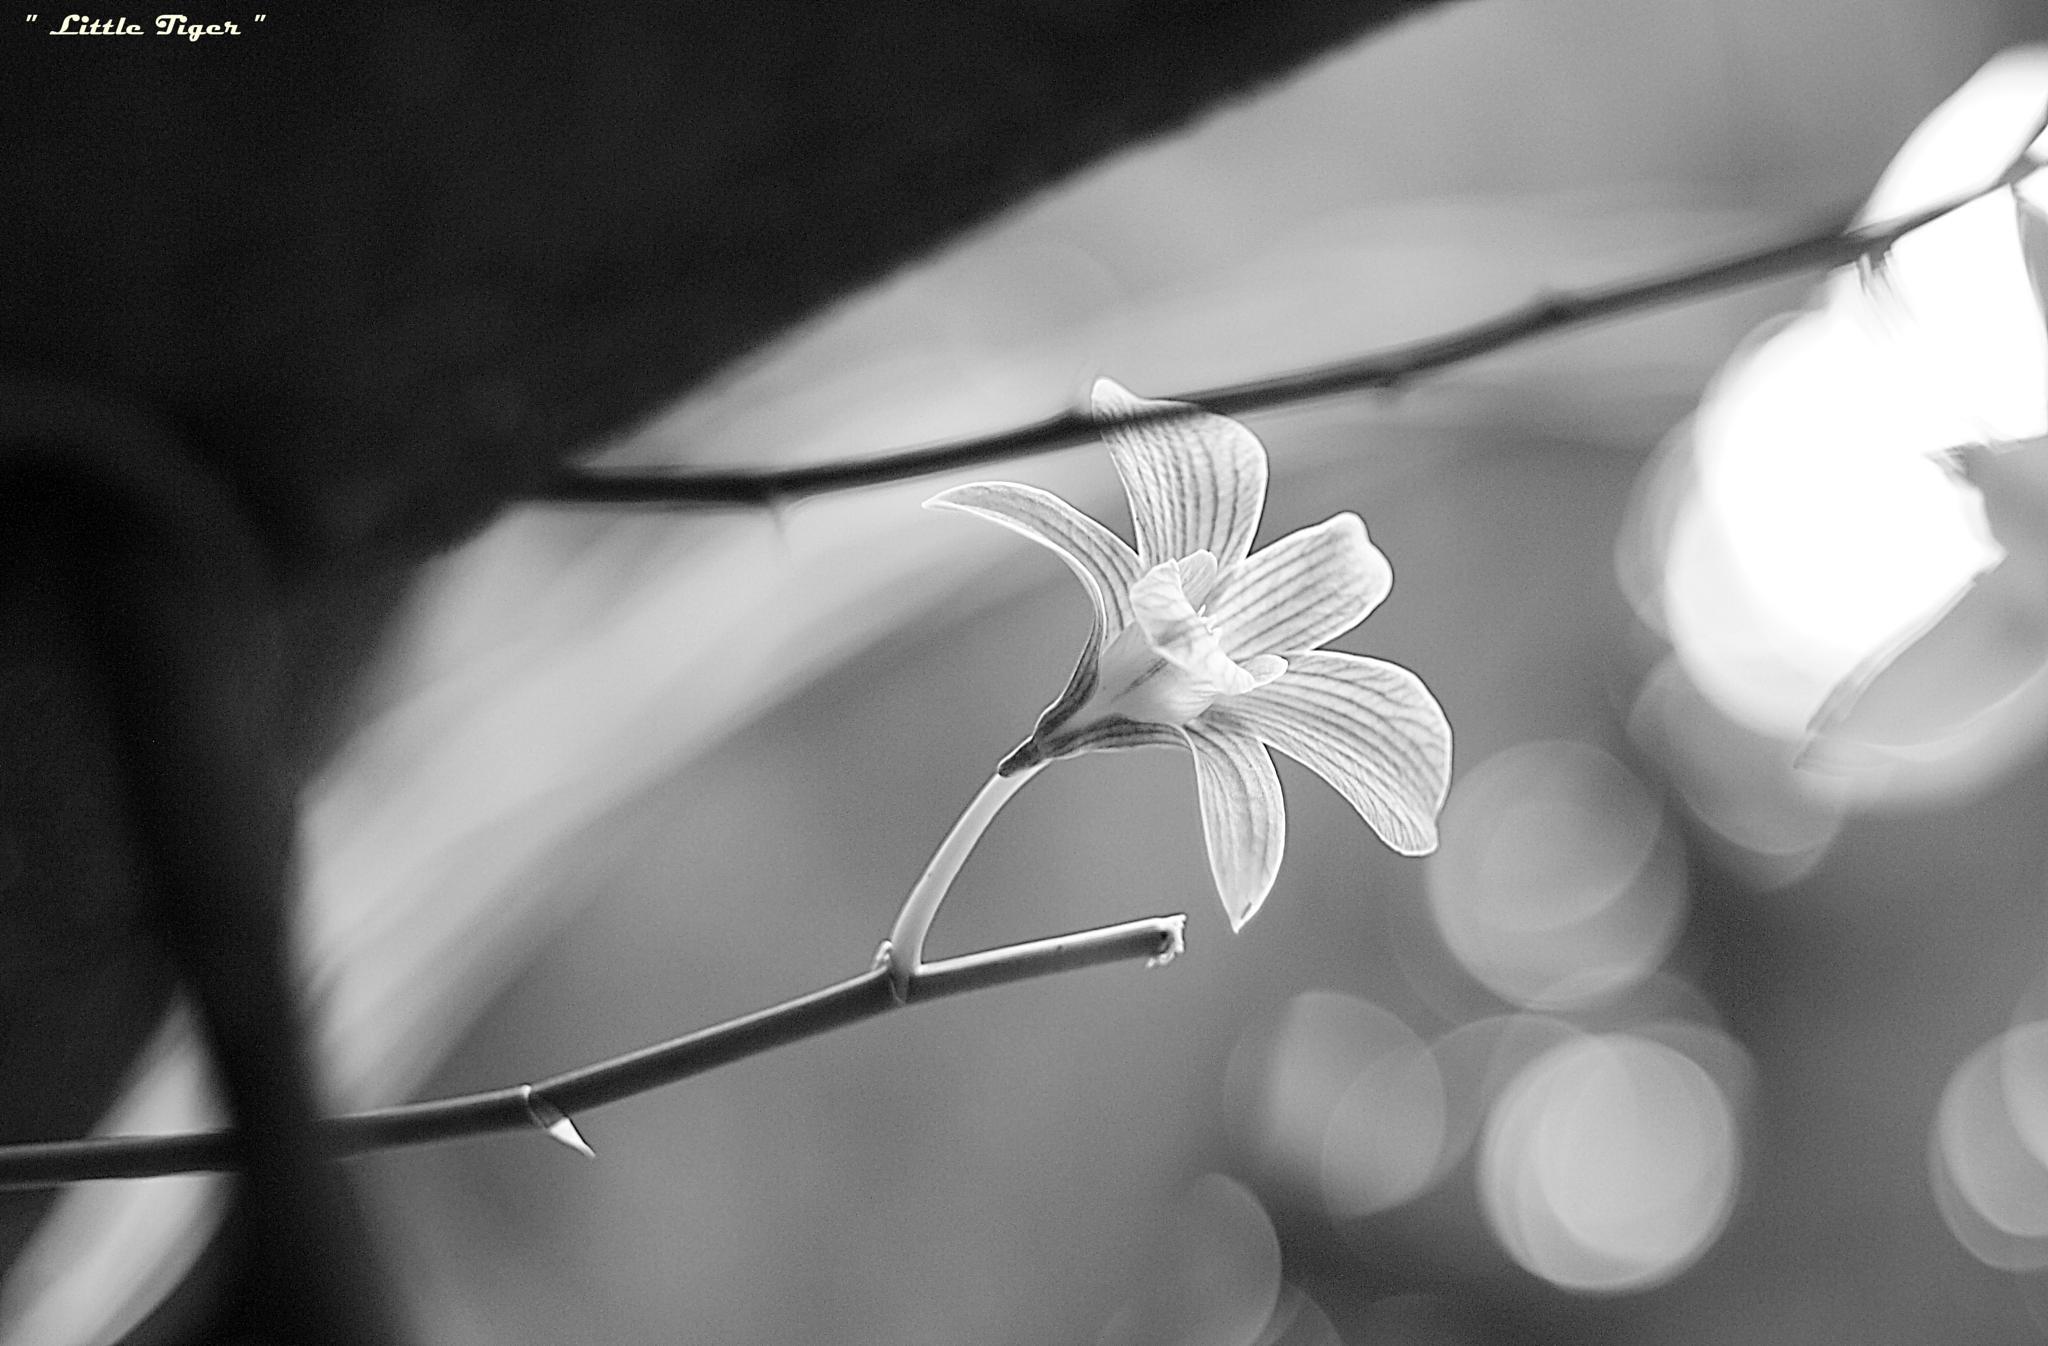 Monochrome orchid no.2 by PJ. Jakranuwat